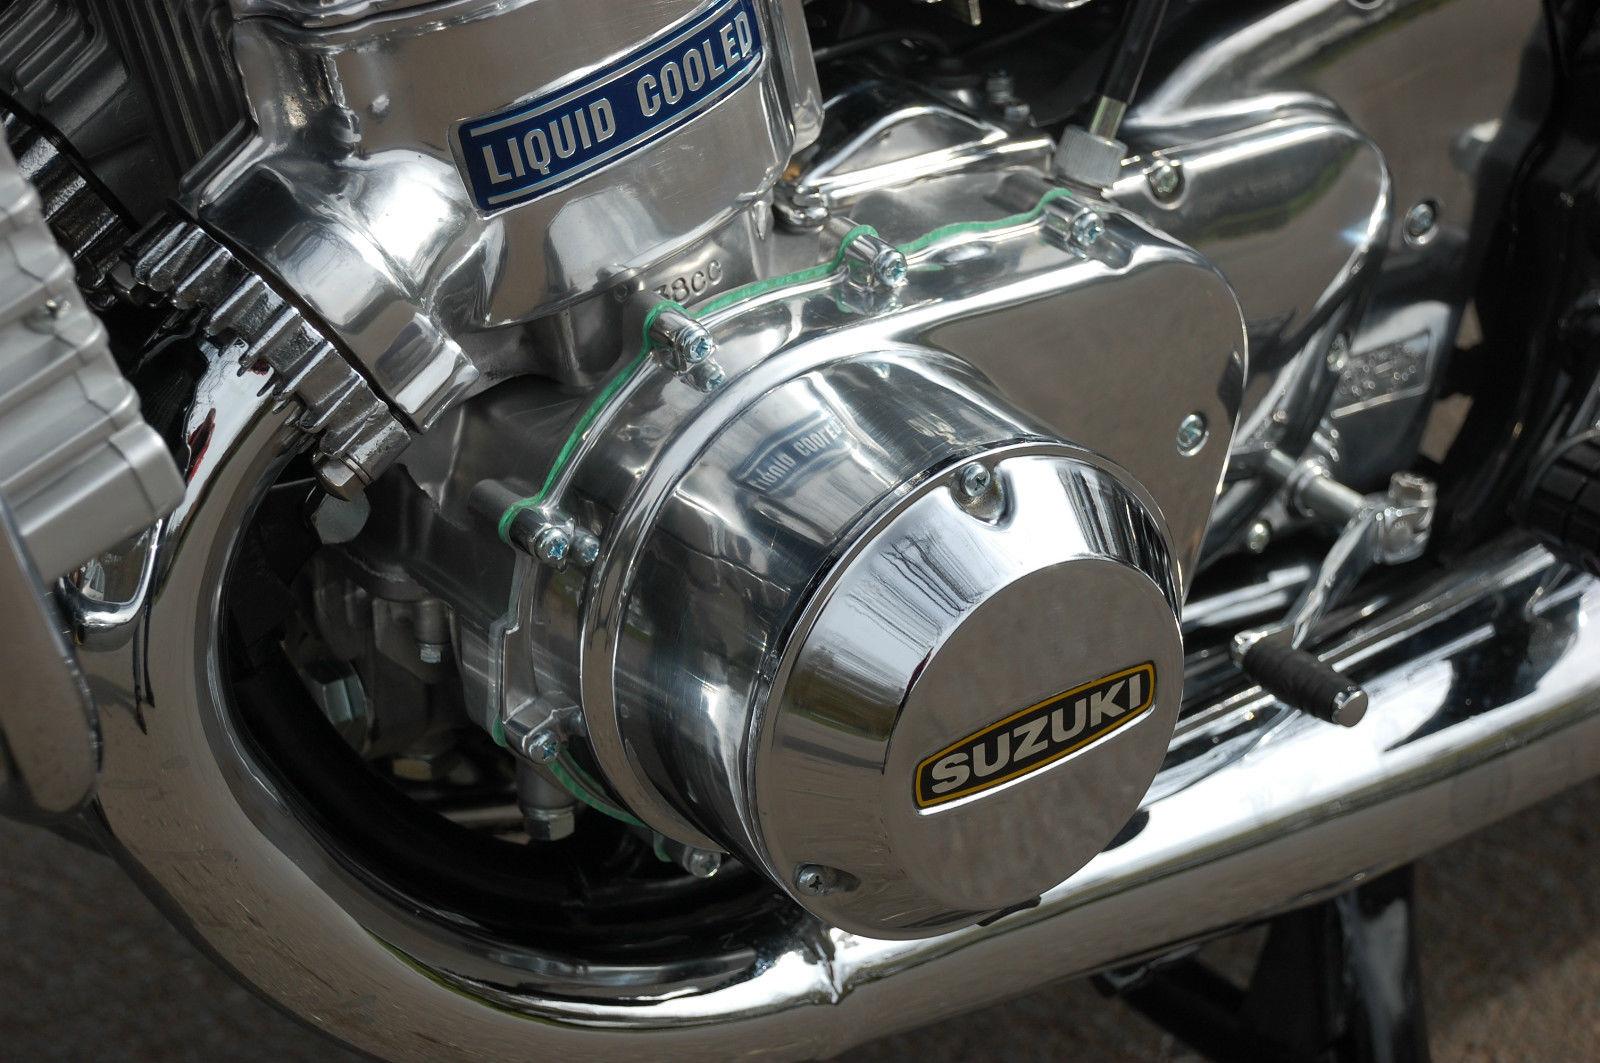 Suzuki GT750 - 1975 - Barrels, Generator Cover, Exhaust and Sprocket Cover.